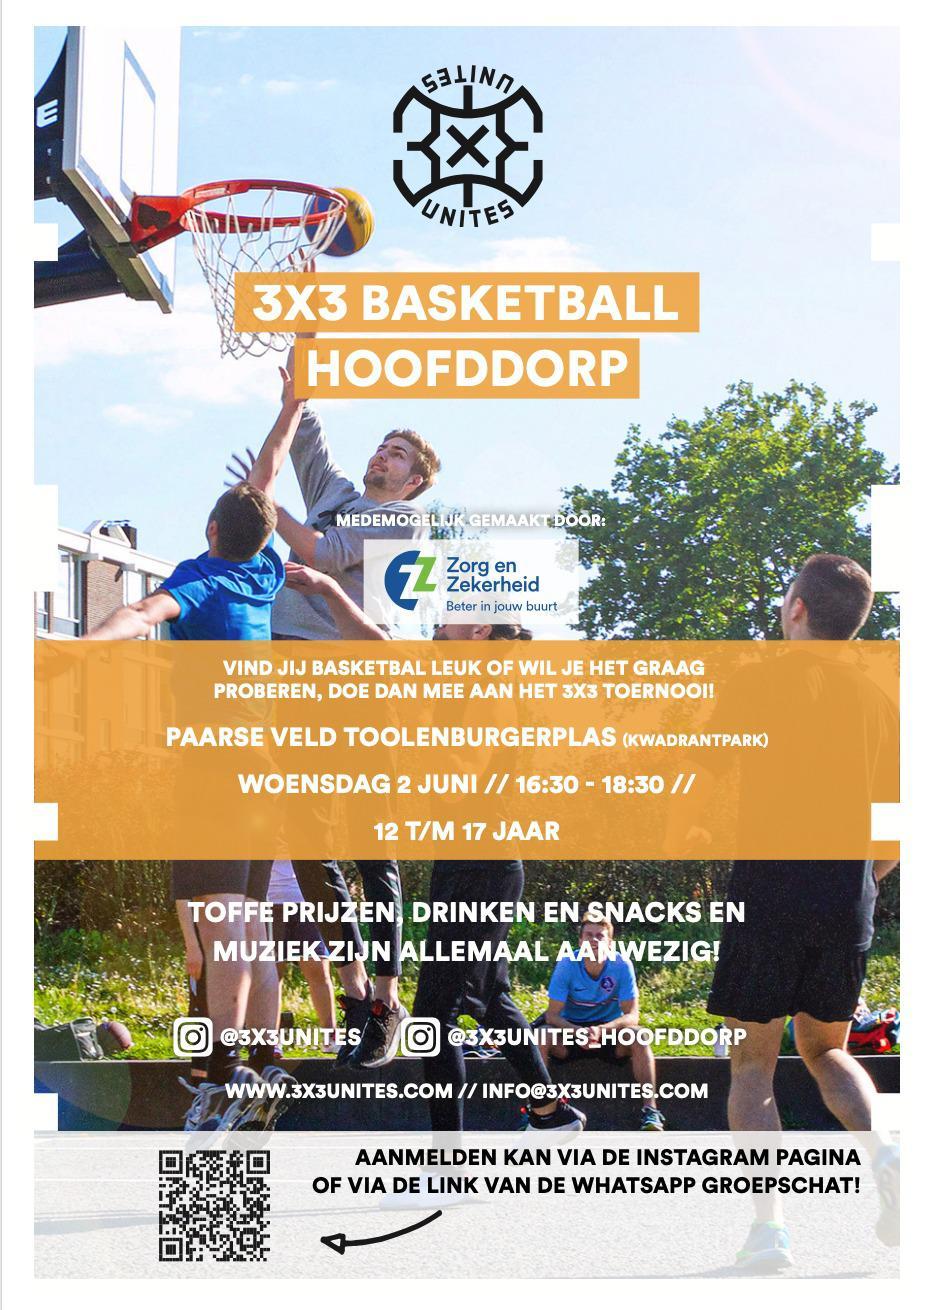 3x3 Basketbaltoernooi op woensdag 2 juni